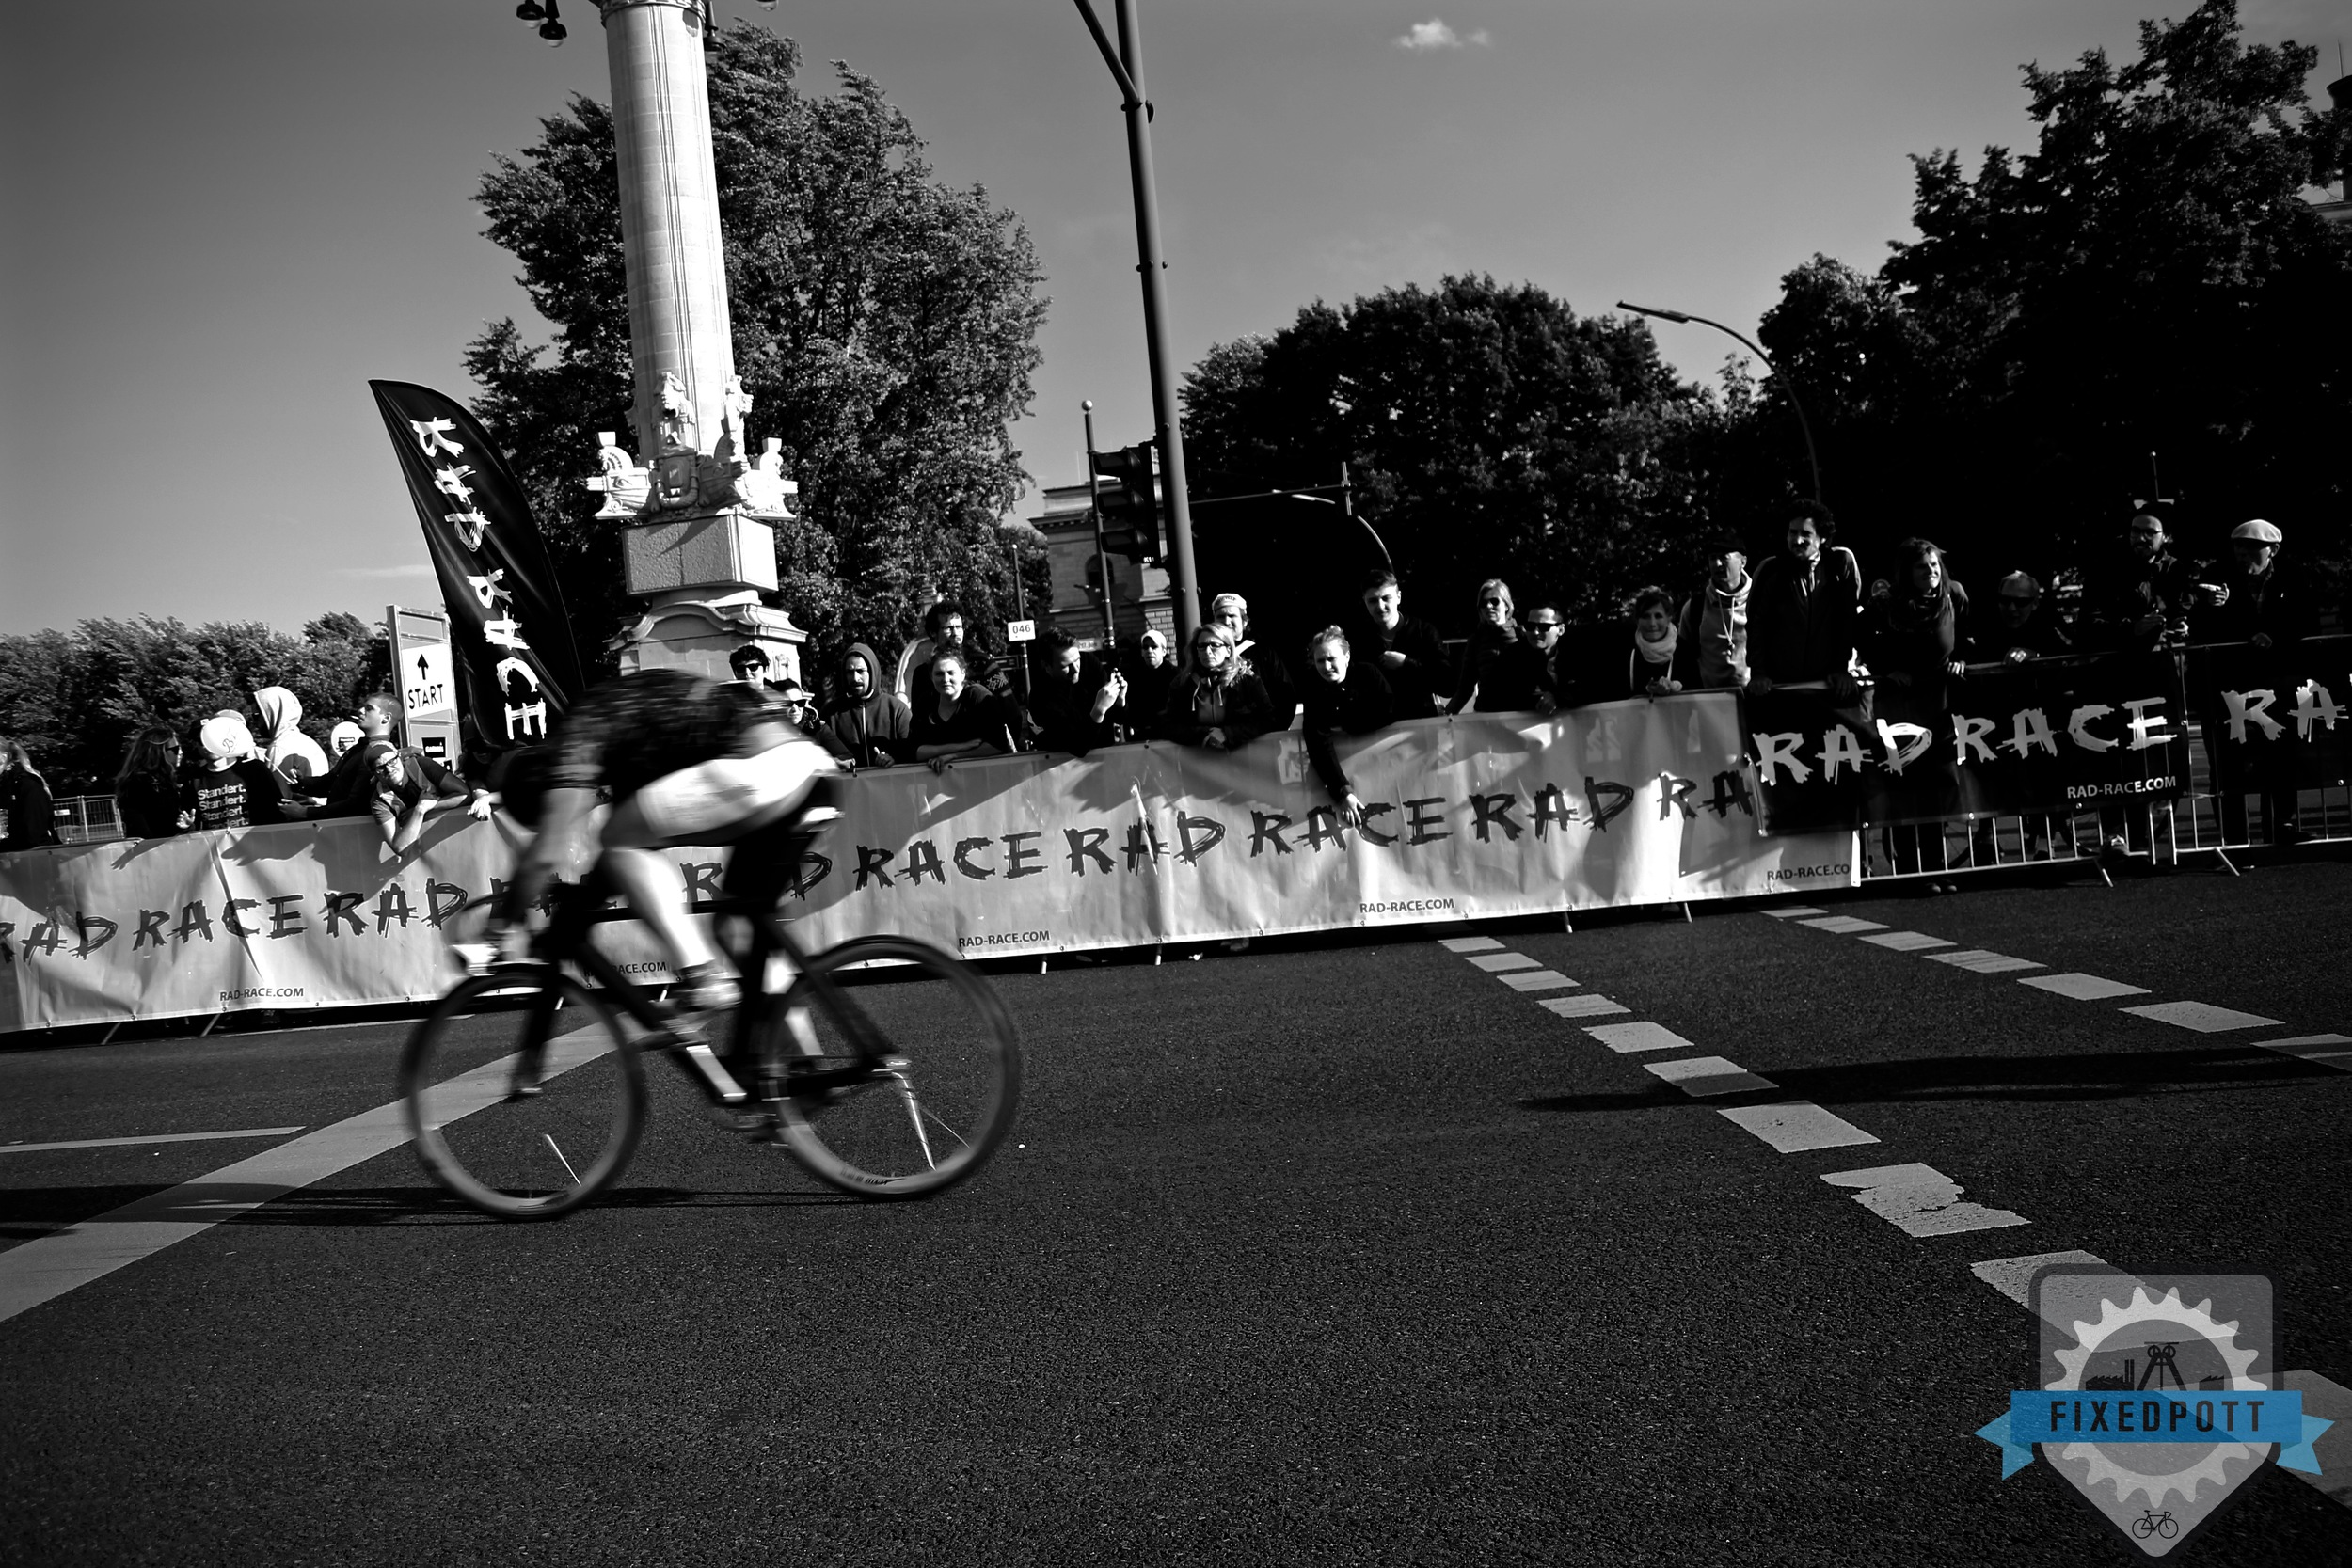 RAD RACE Battle, Berlin May 30 2015 Photo by Max Höflich_02.jpg